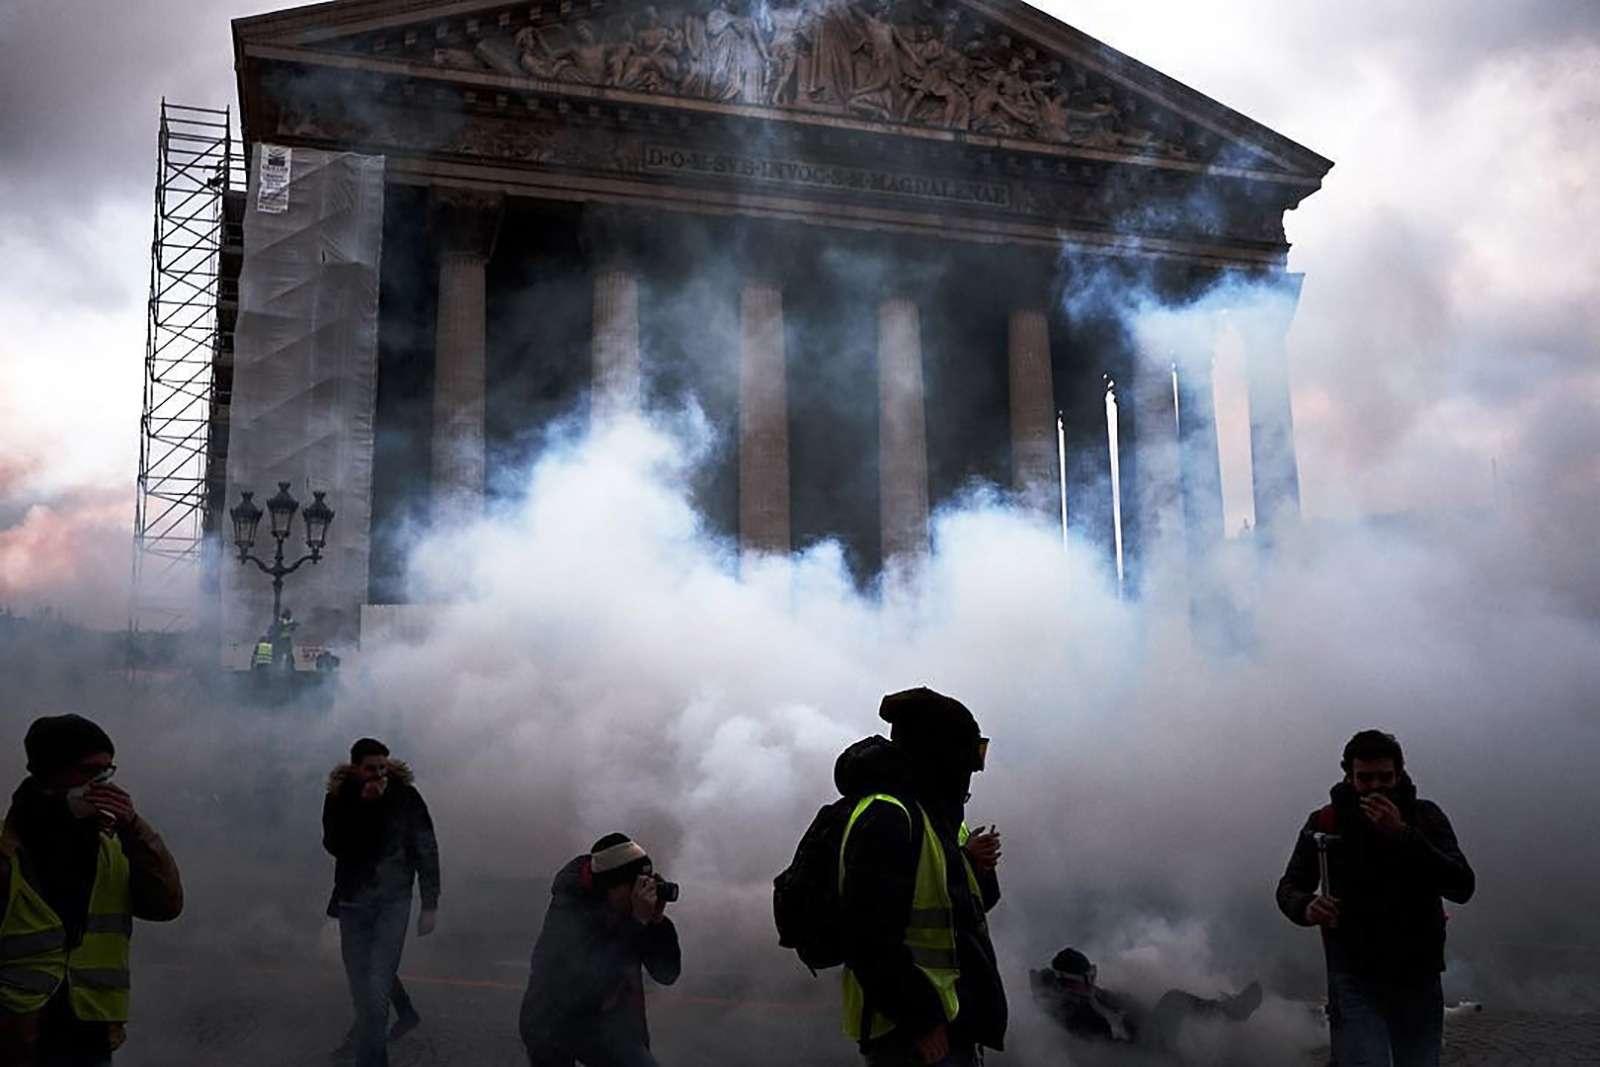 Какфранцузы протестуют против роста цен натопливо: баррикады против водометов— фото 926170